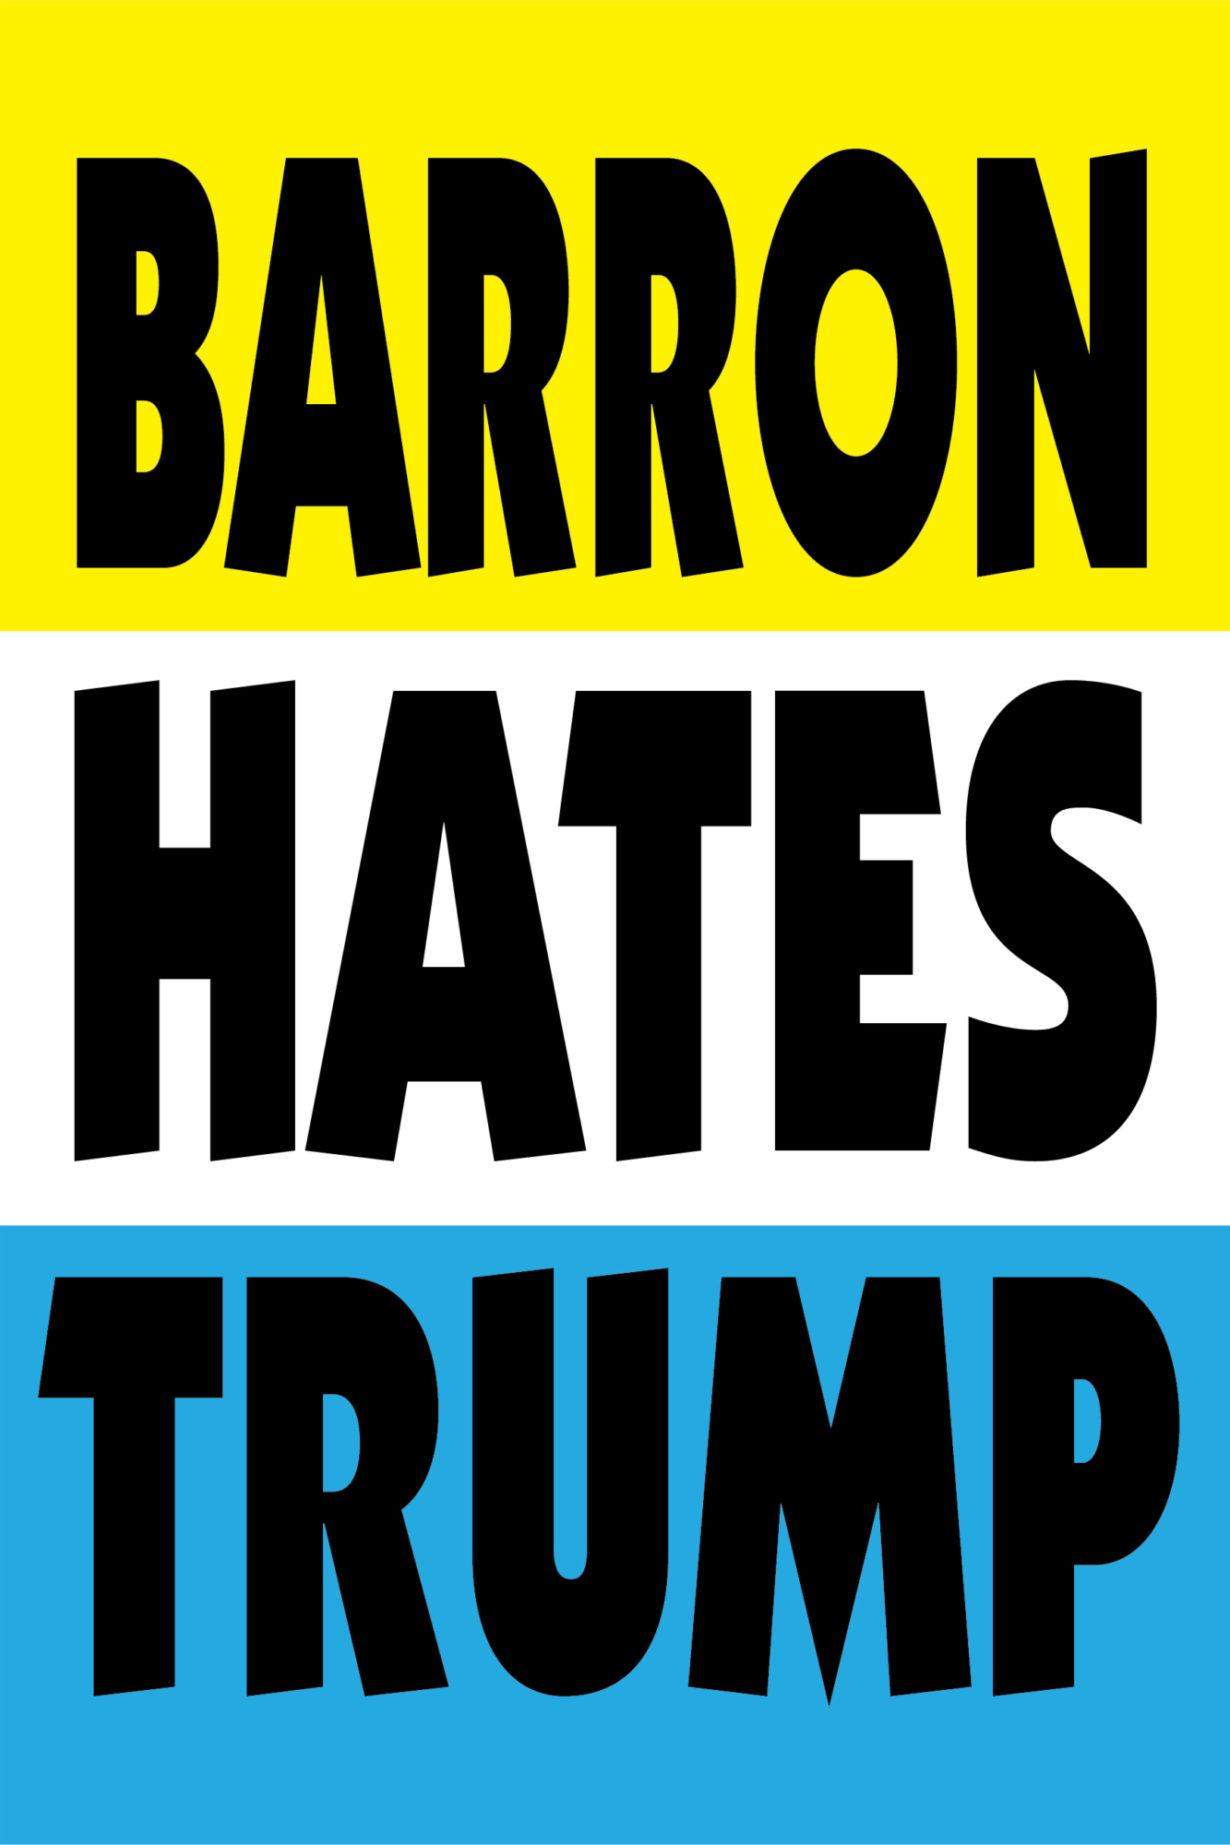 NP_26_50_2017_Barron-Hates-Trump.jpg